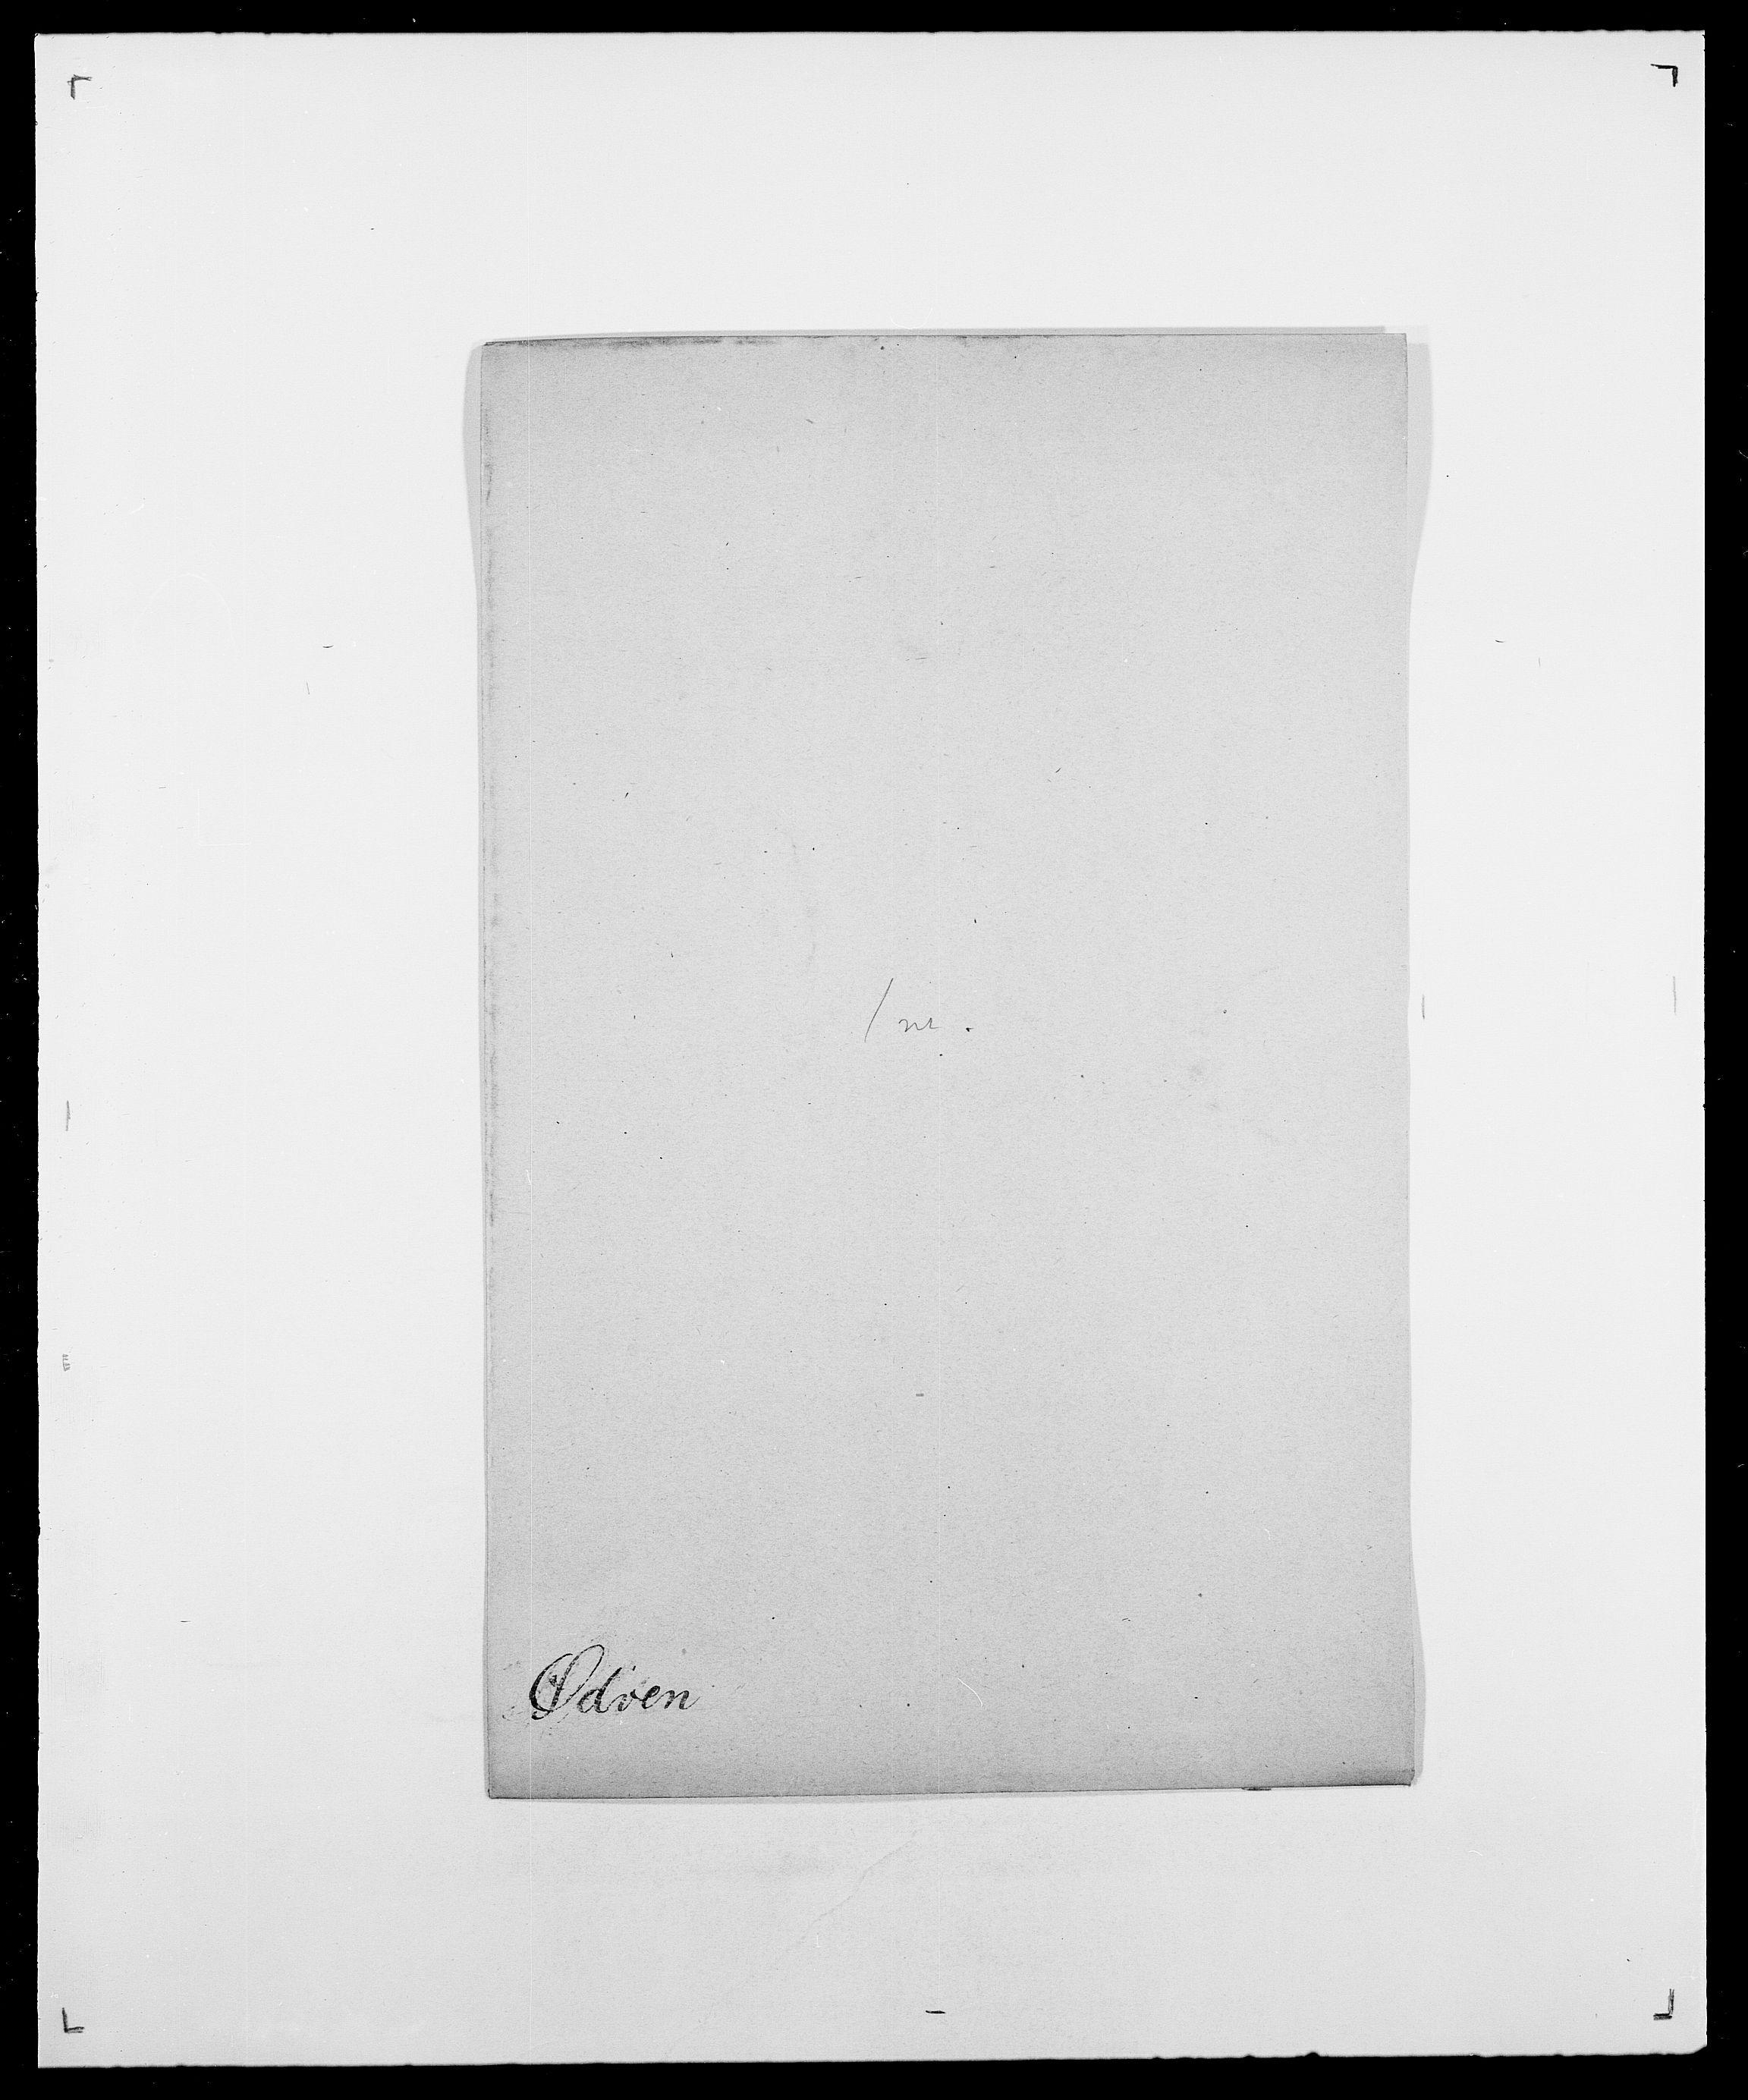 SAO, Delgobe, Charles Antoine - samling, D/Da/L0043: Wulfsberg - v. Zanten, s. 261